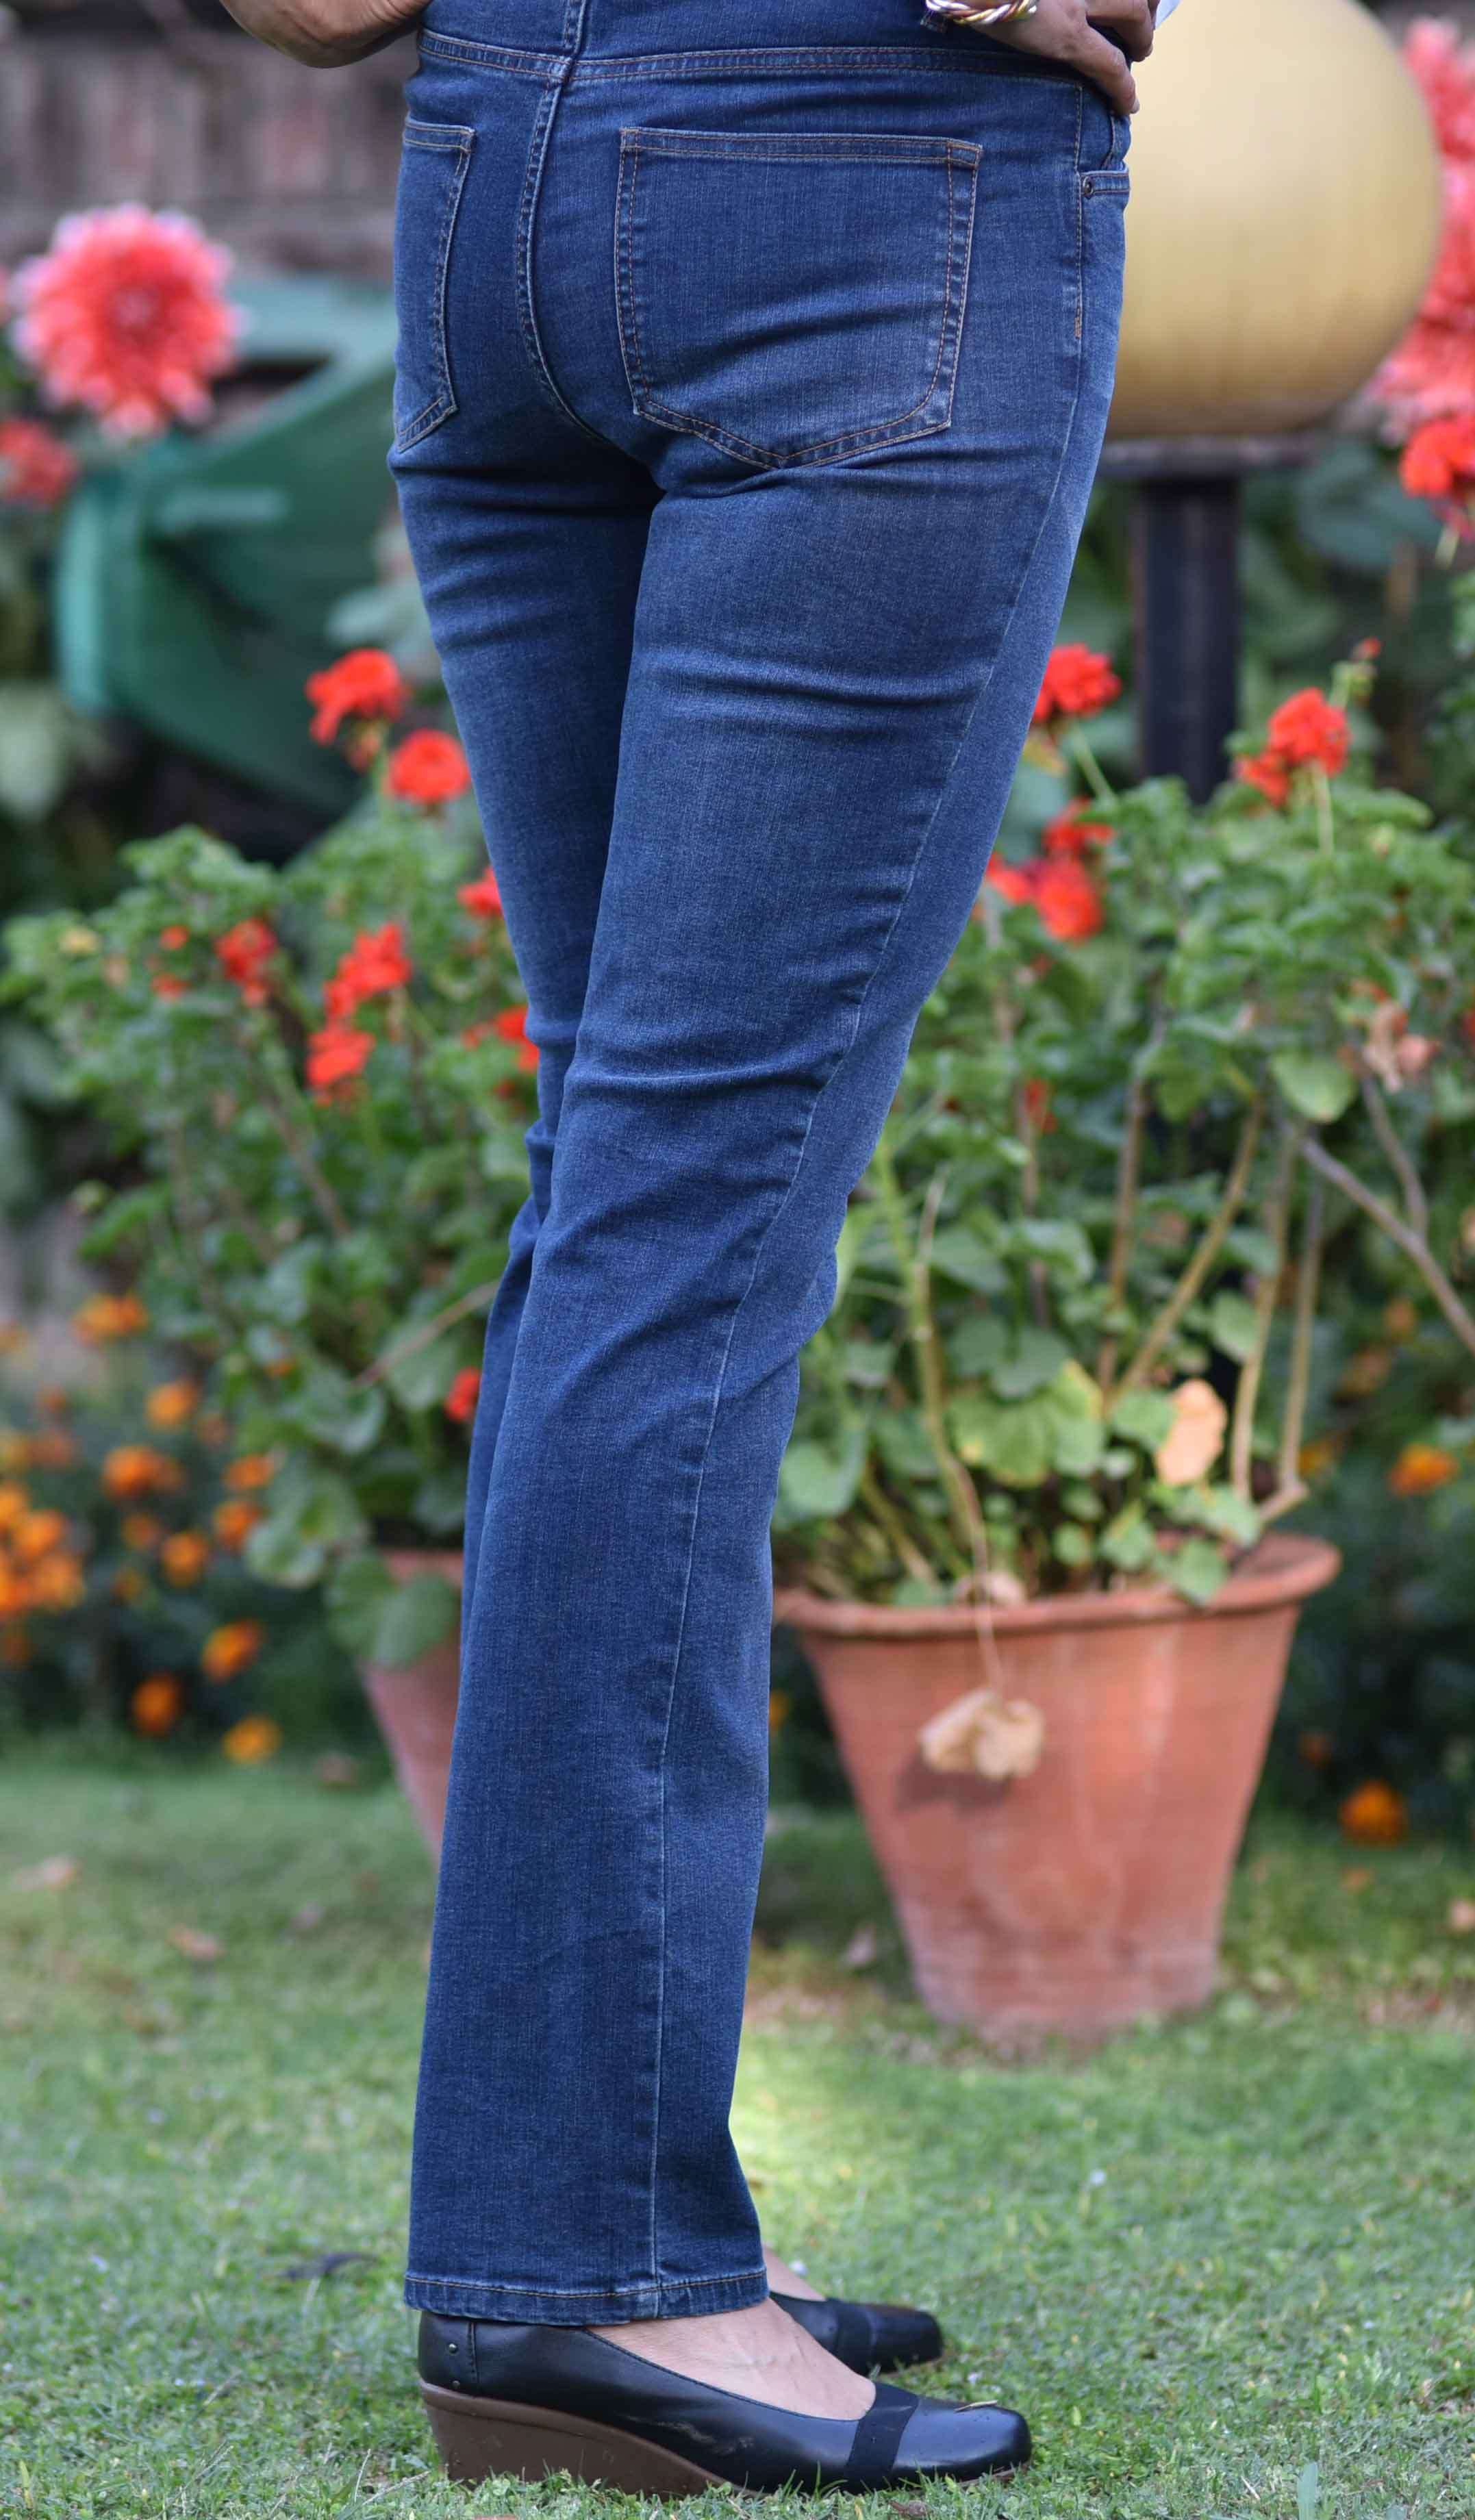 I look good in the JJill Smooth Fit Straight Leg Jeans! Image©gunjanvirk